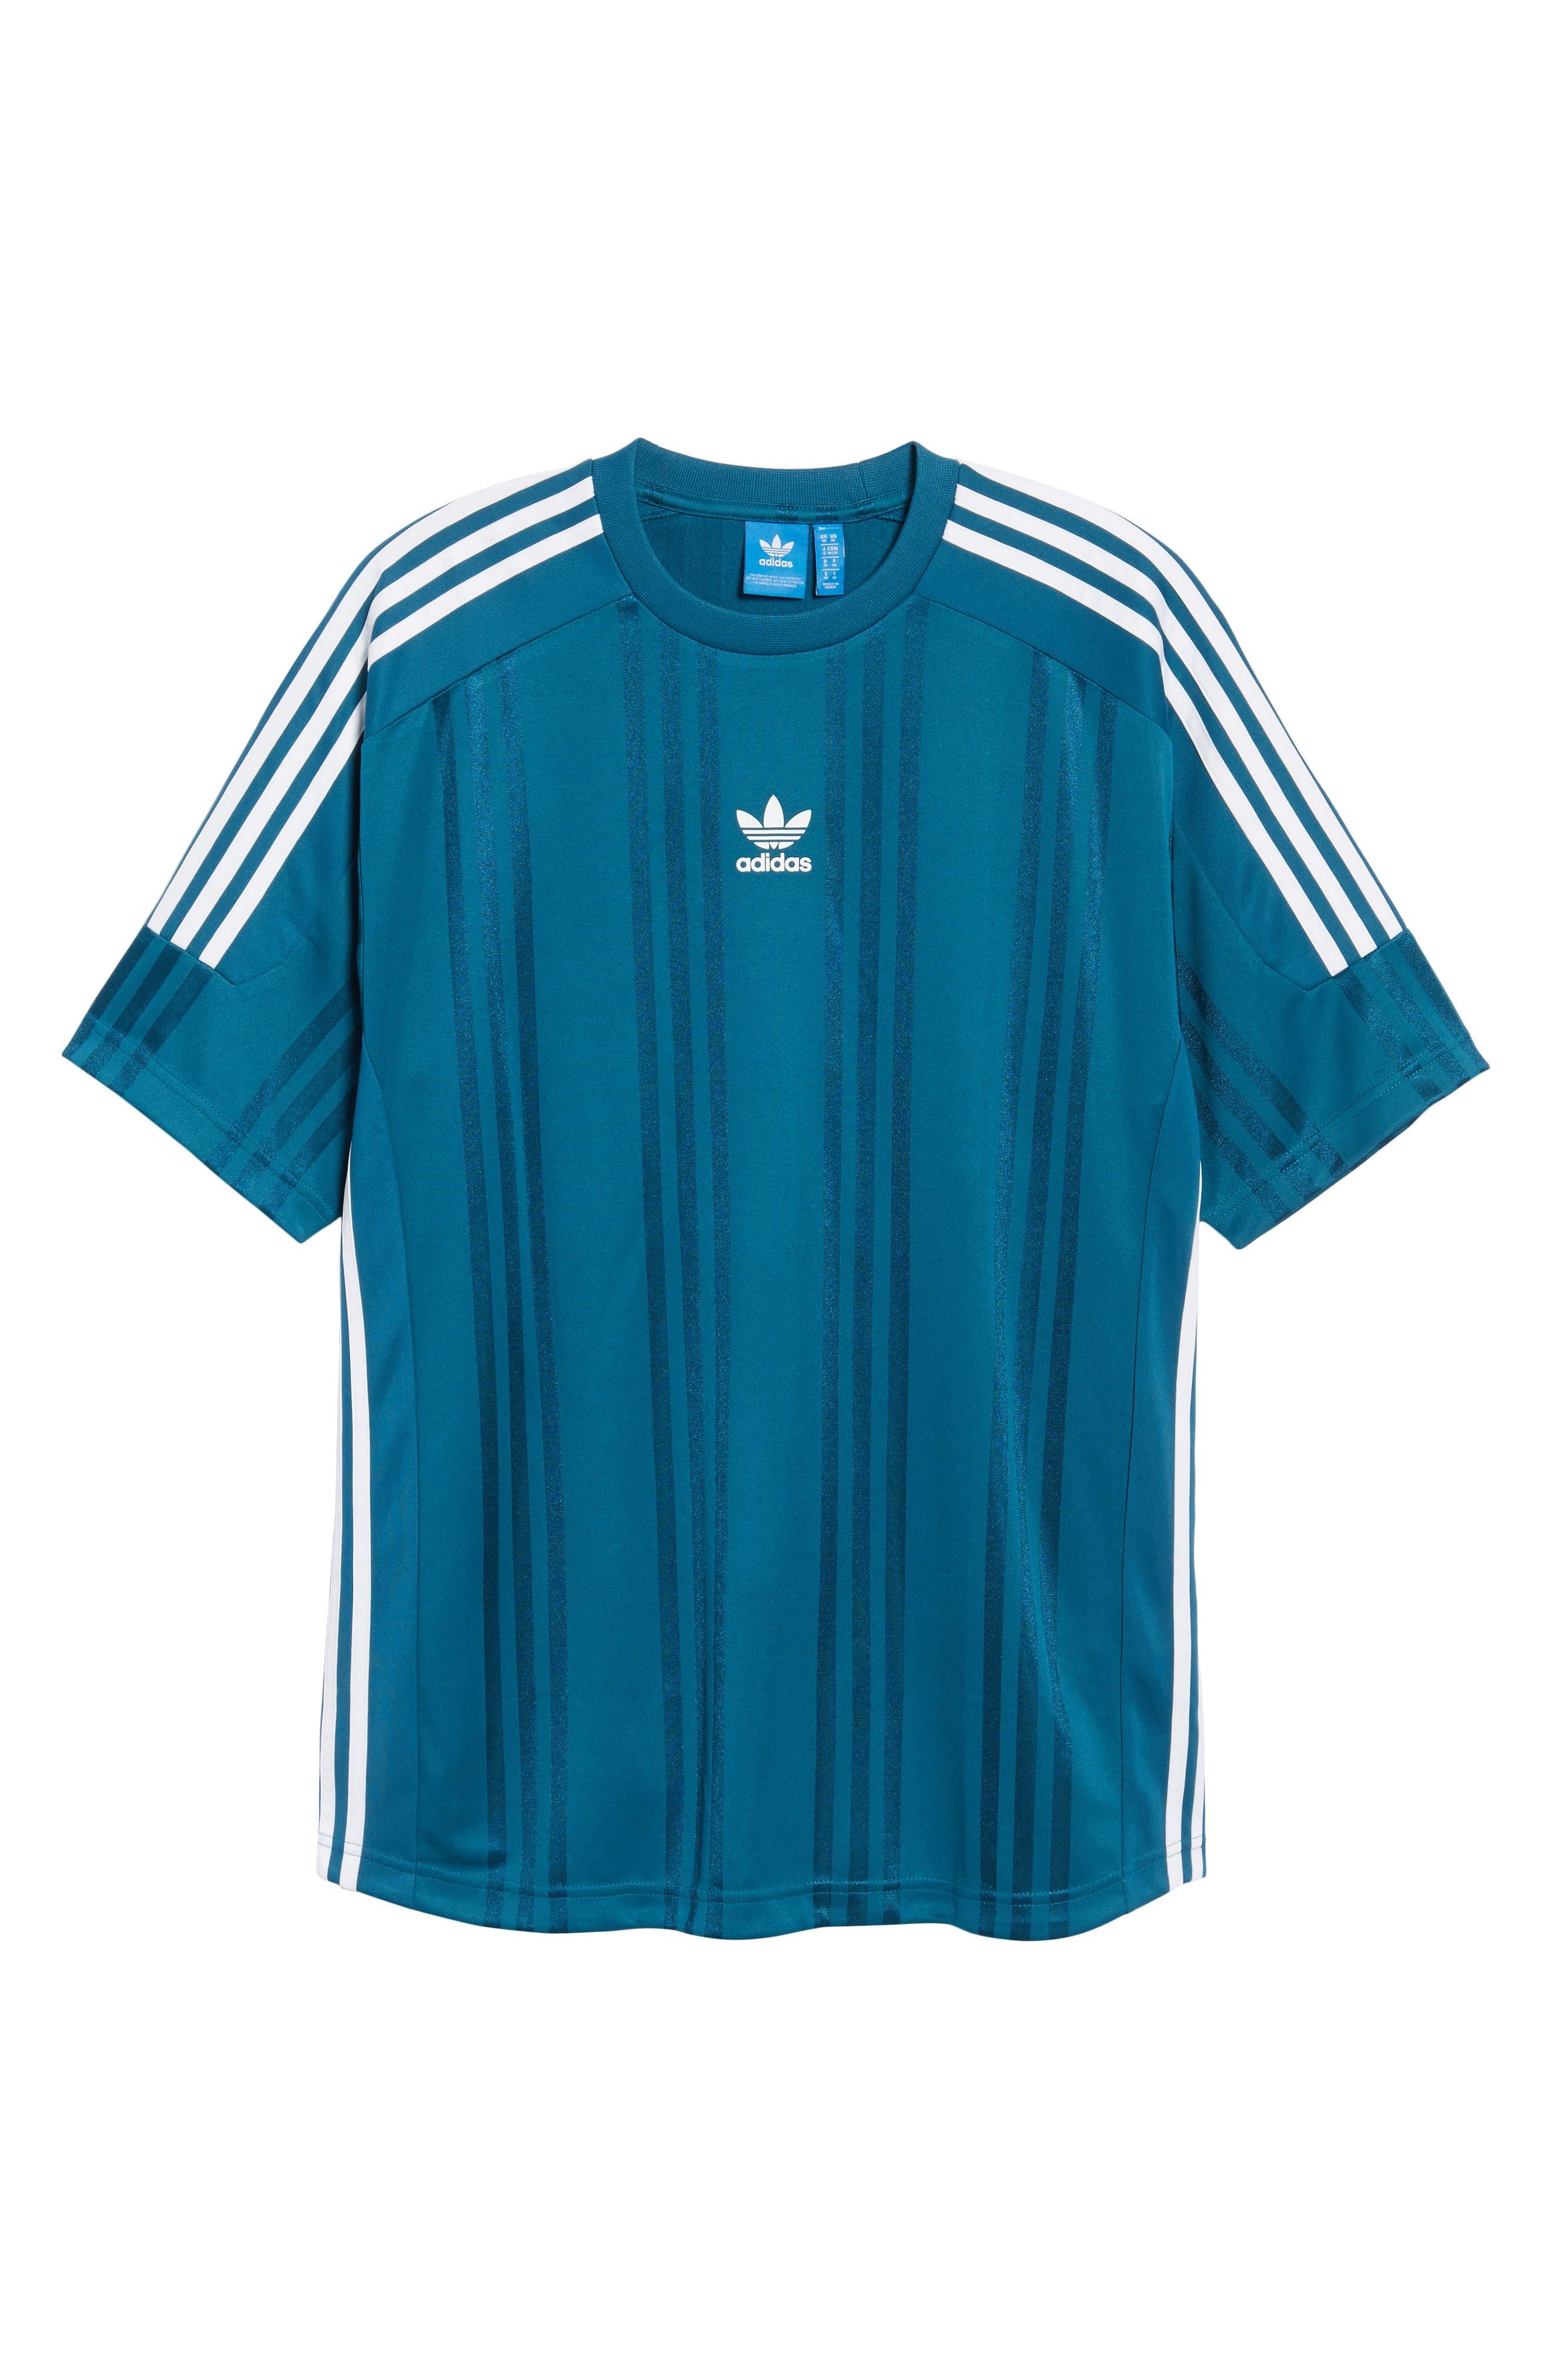 Originals Jacquard Stripe T-Shirt,                             Alternate thumbnail 6, color,                             Real Teal